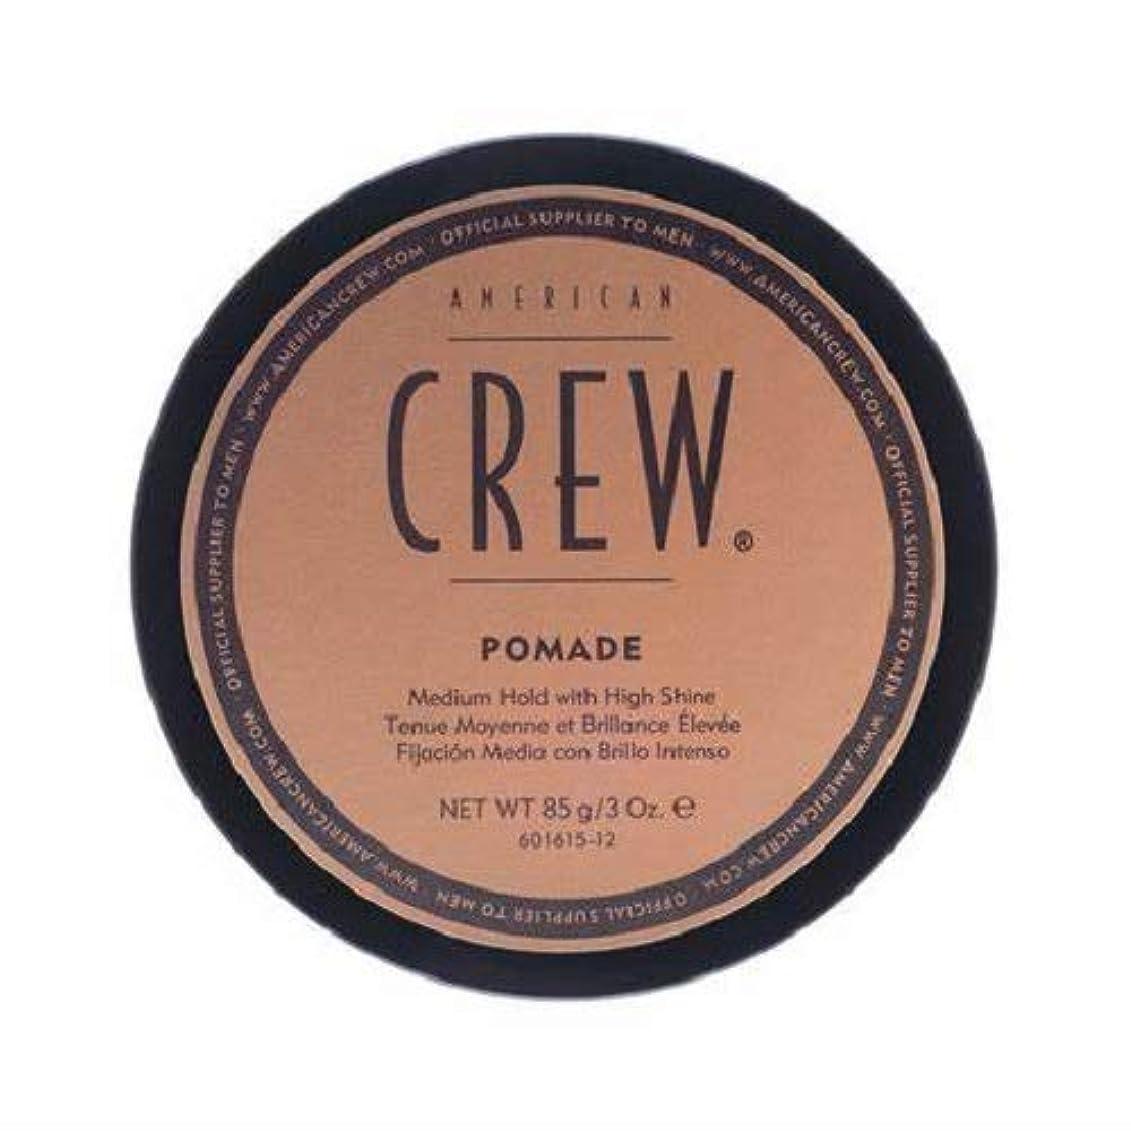 年金受給者農村怖いCrew Styling by American Crew Pomade m 85g (並行輸入品)